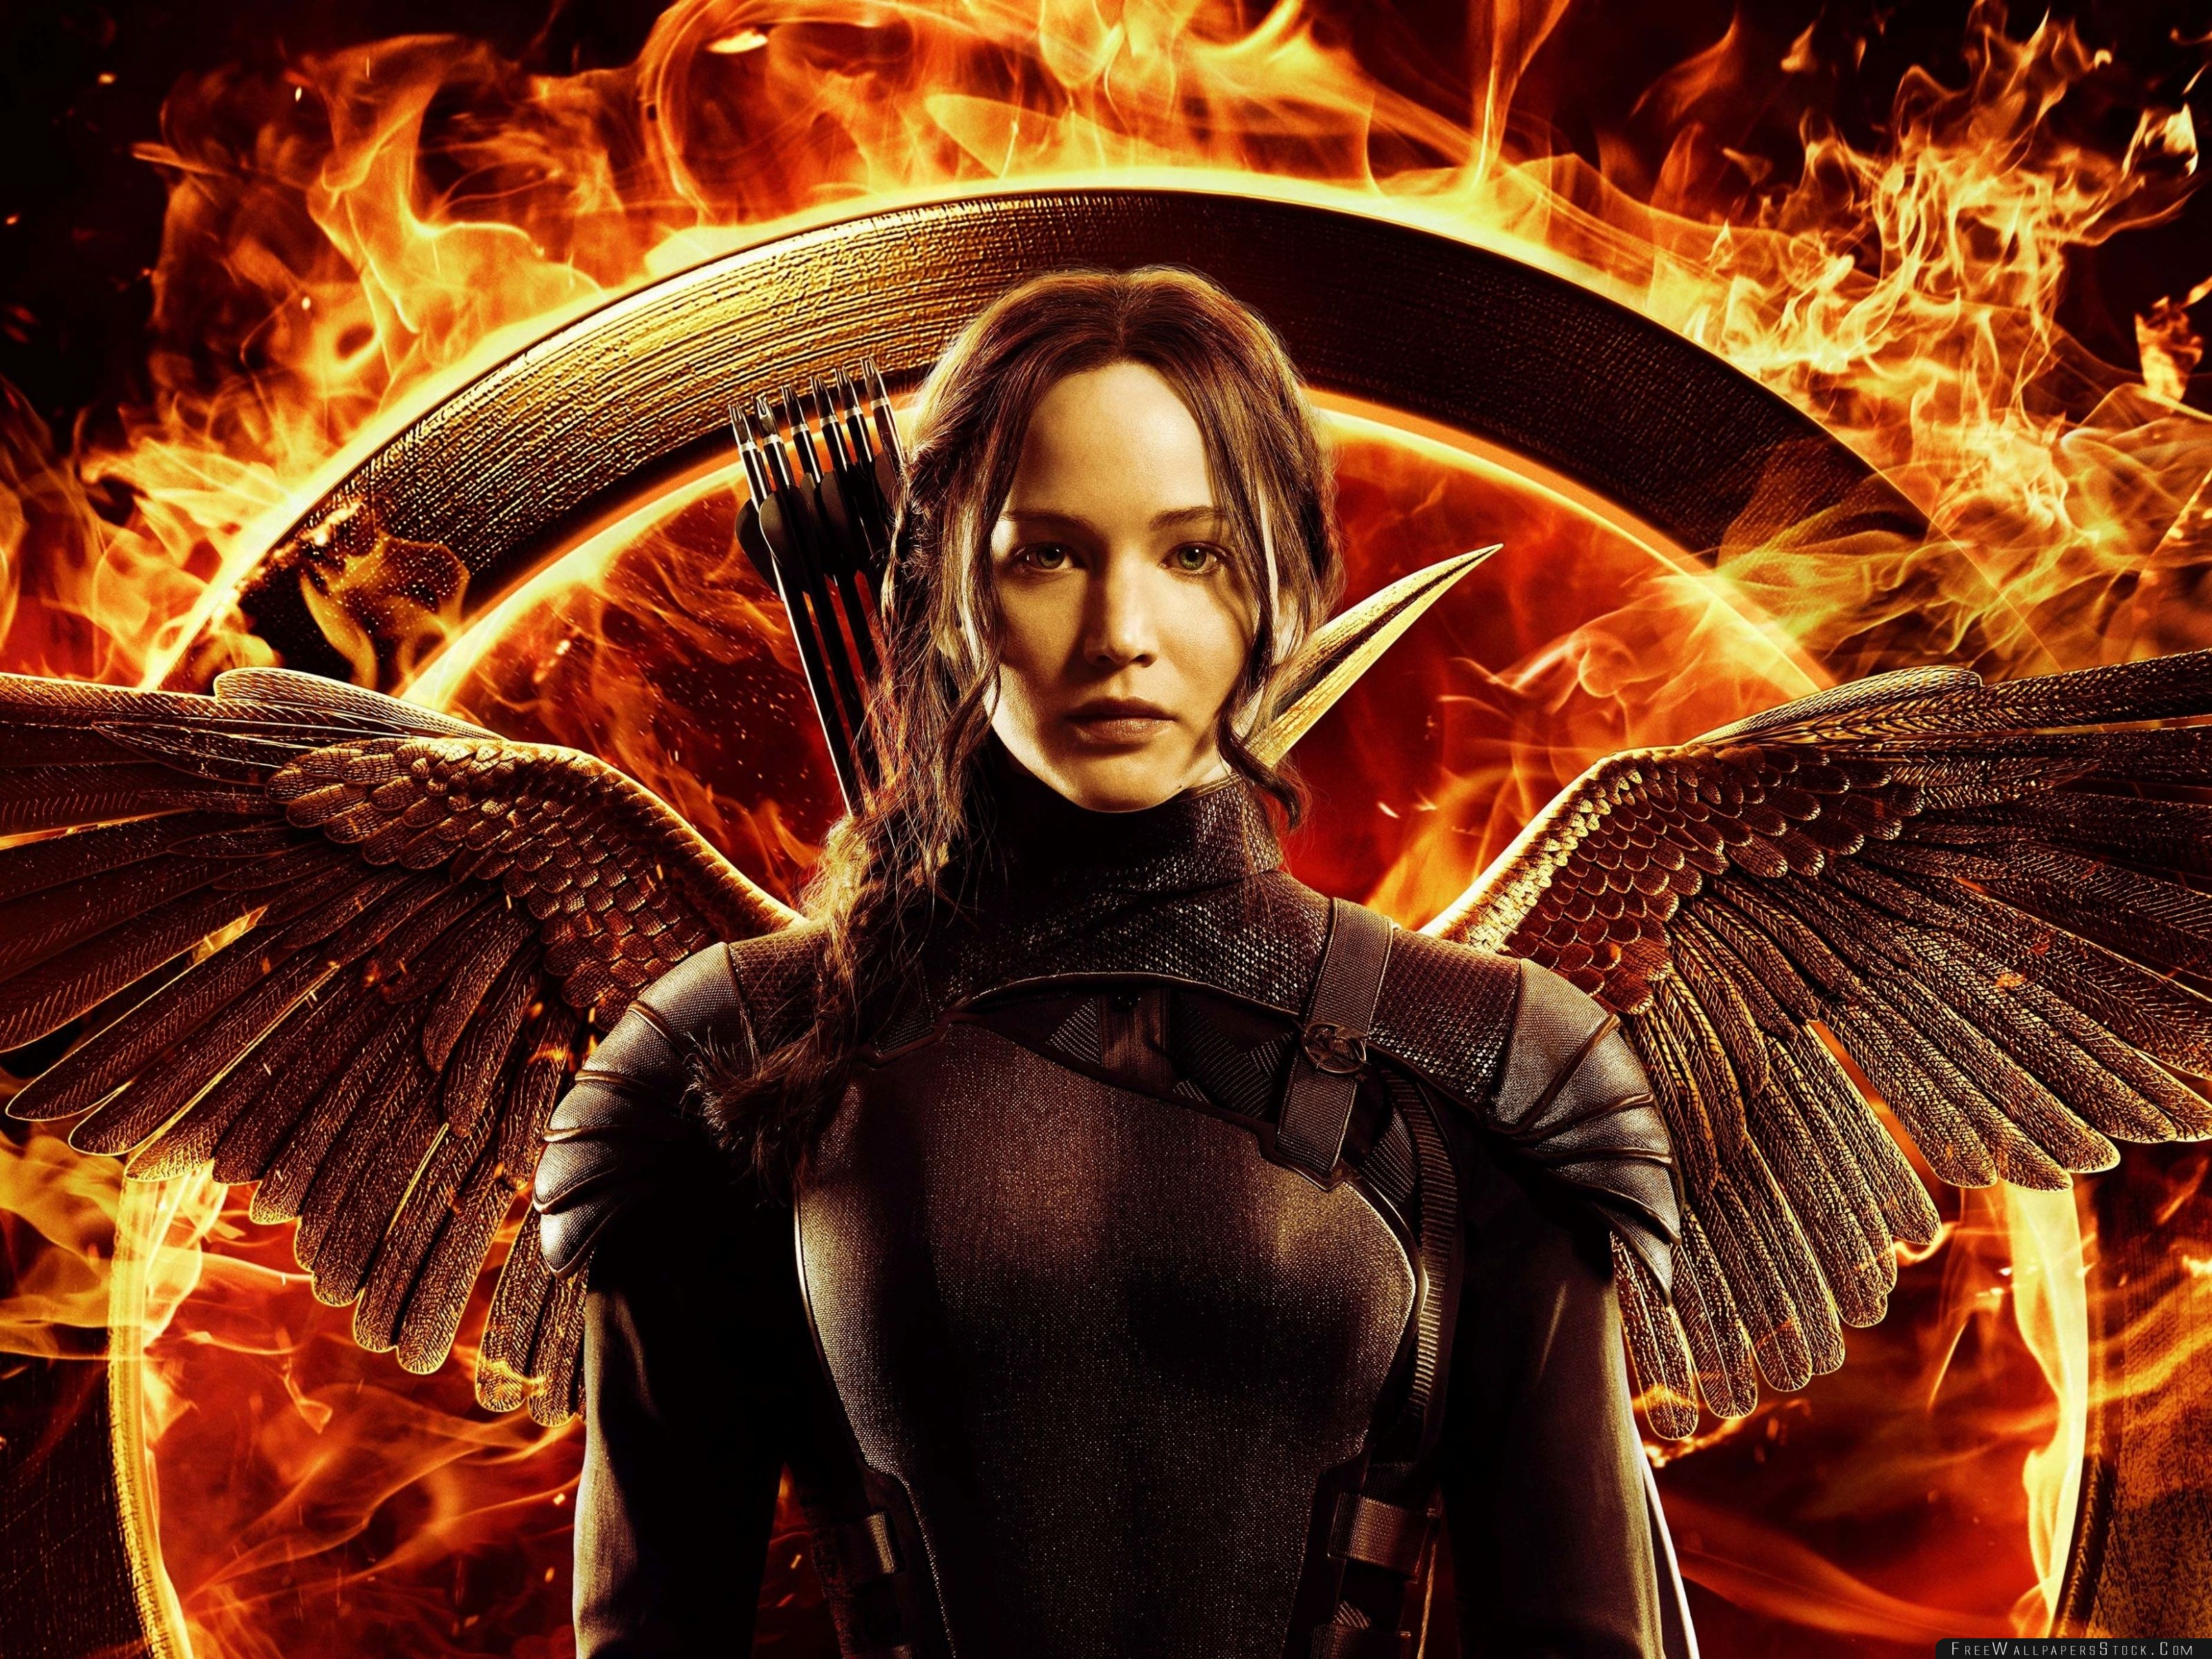 Download Free Wallpaper The Hunger Games Mockingjay Part Katniss